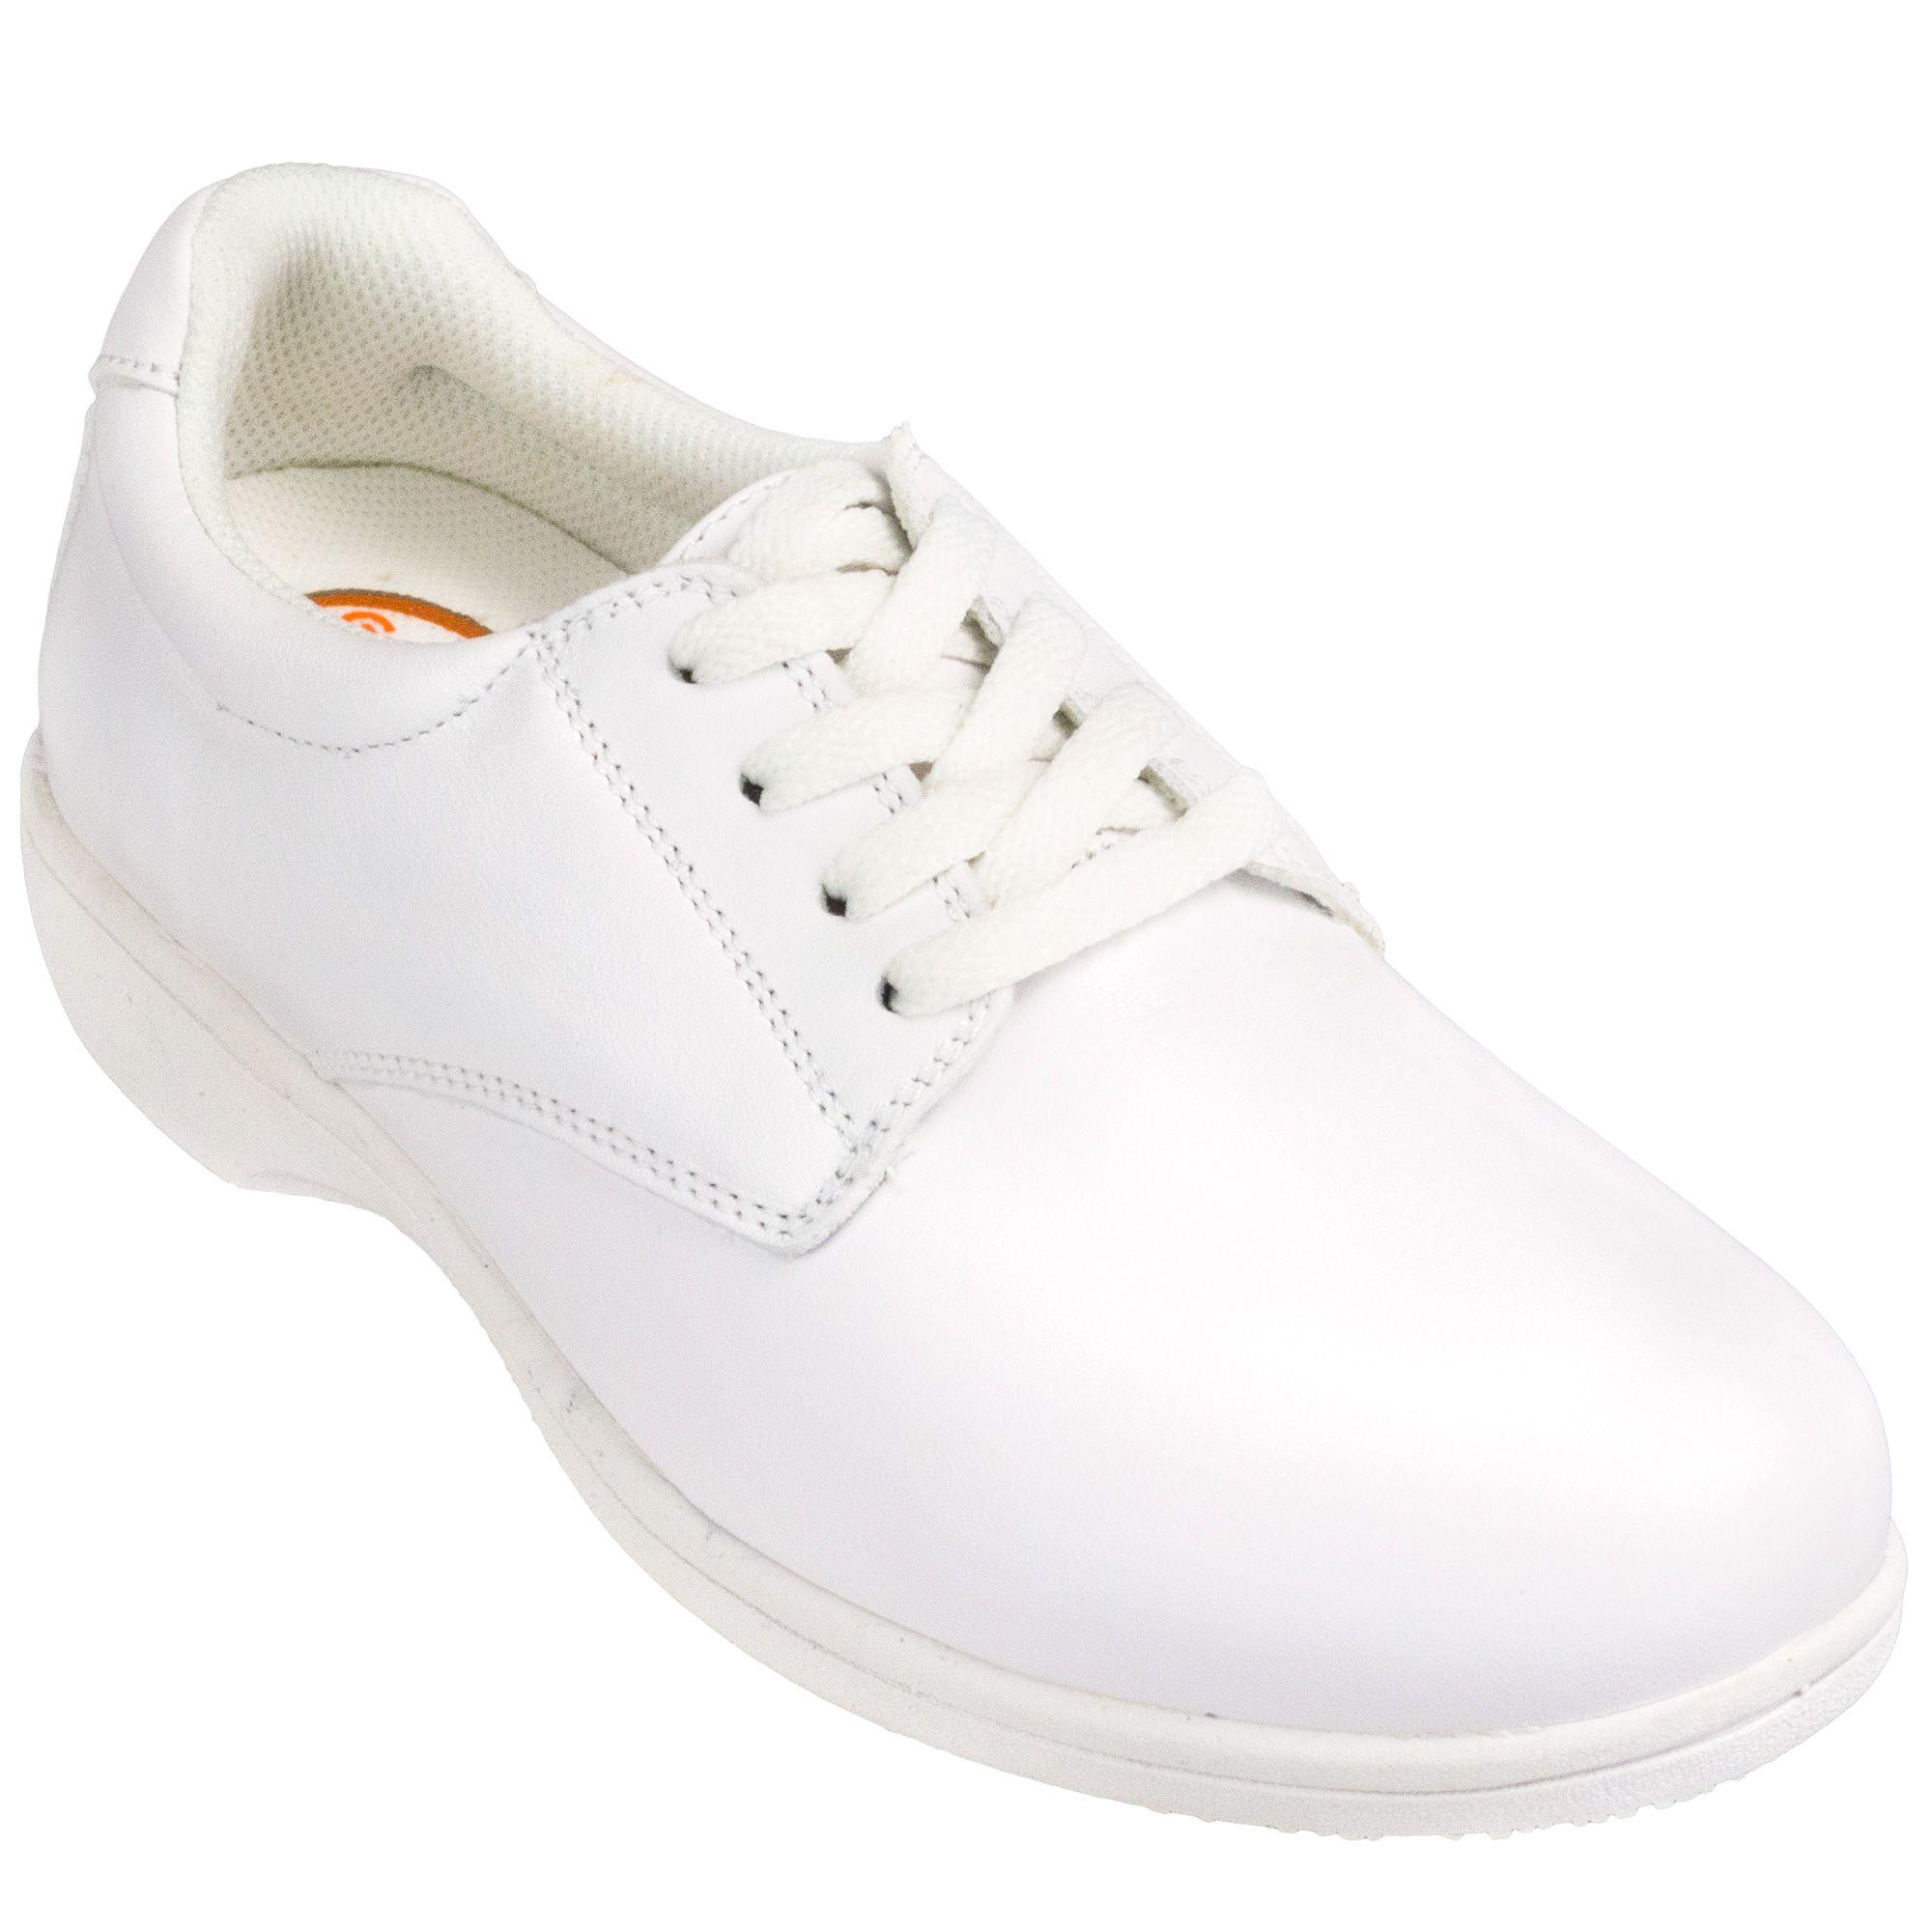 3eb41fdf6989 Genuine Grip Women s 425 White Tie Slip-Resistant Water-Resistant Shoes